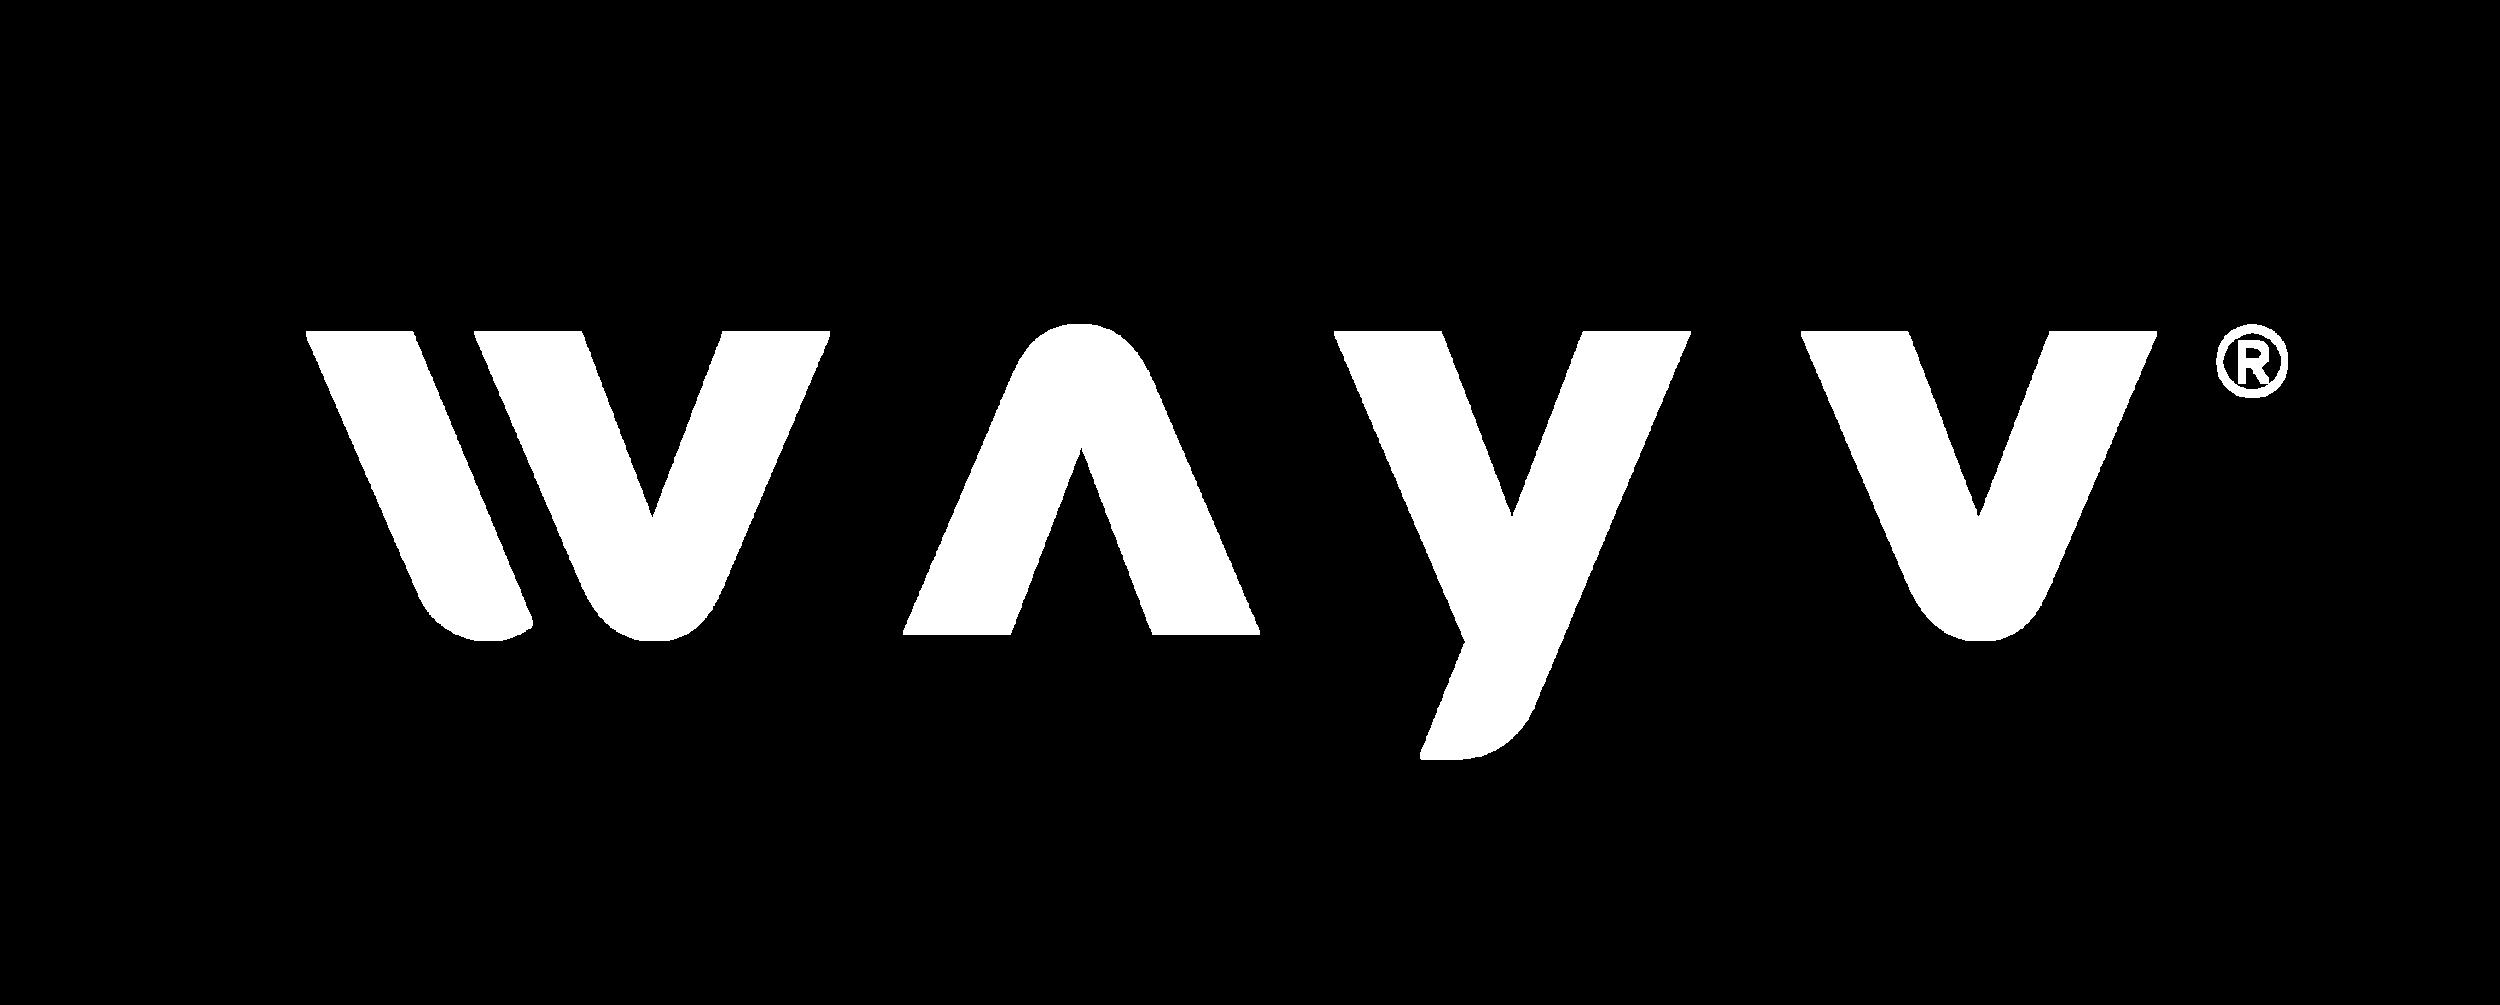 Wayv_White-01.png